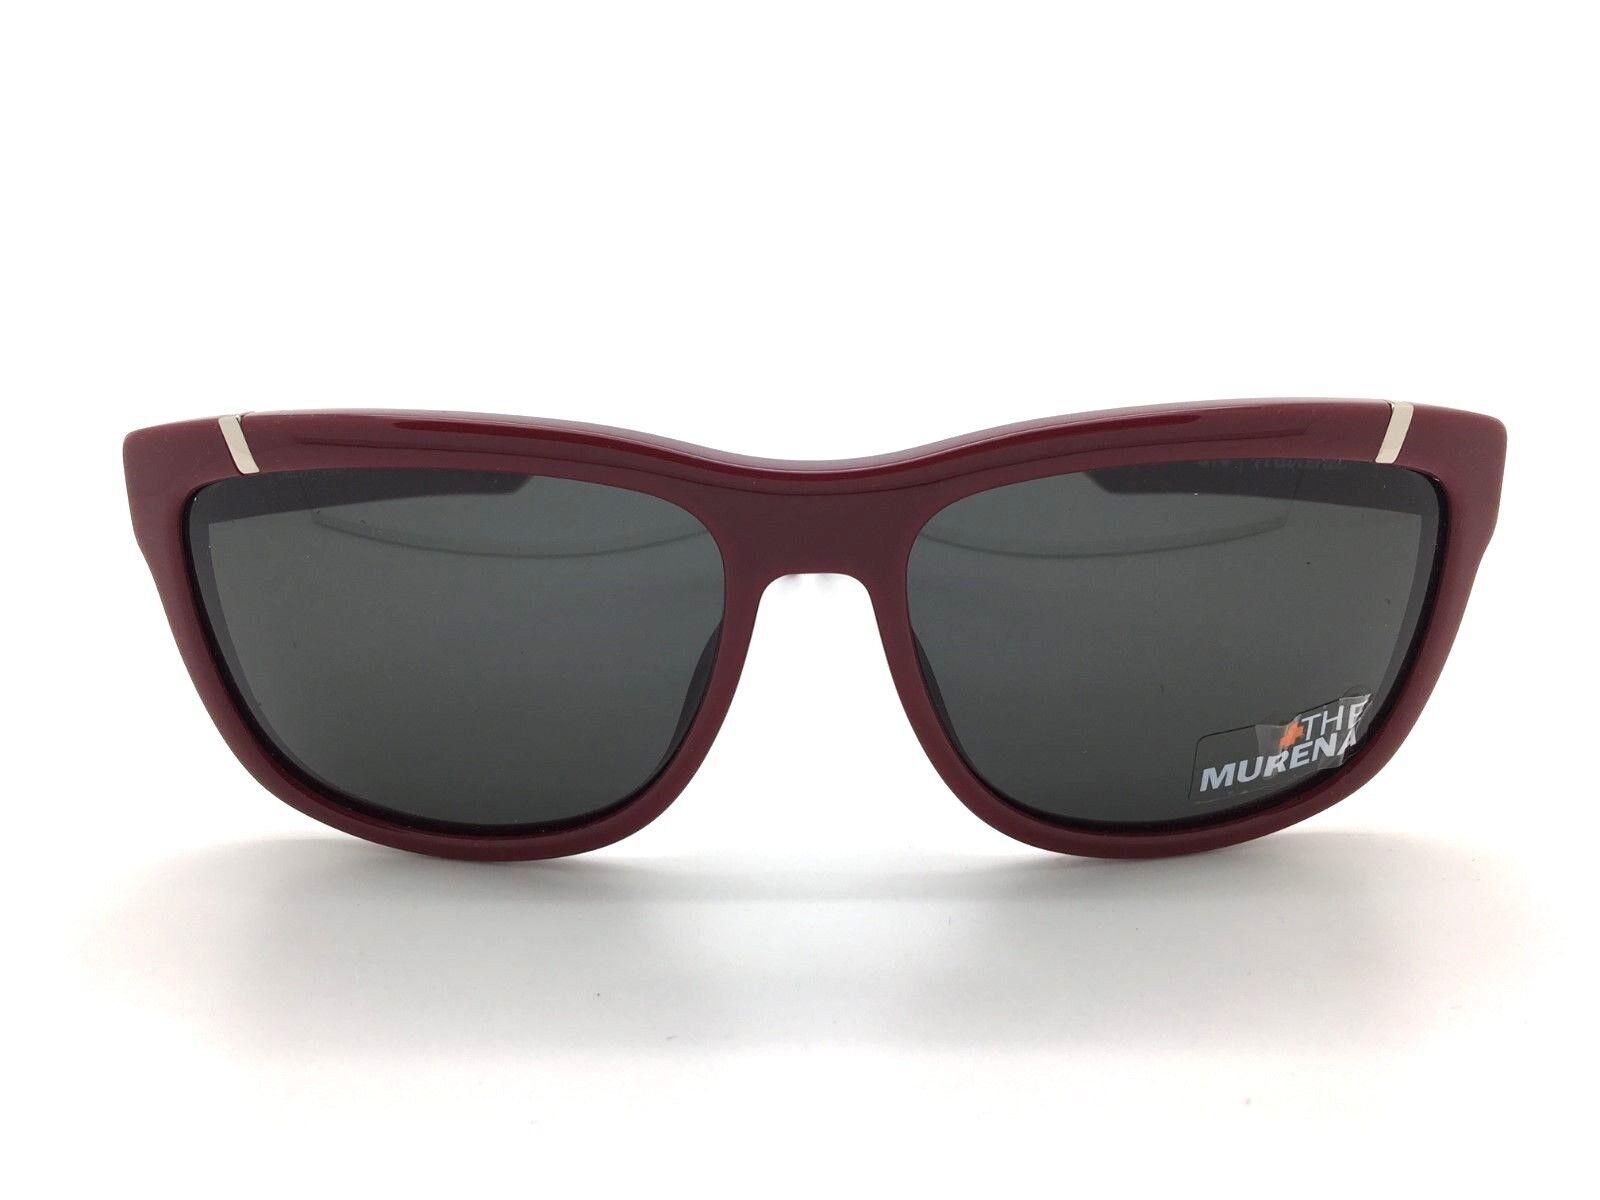 SPY+ Optic Murena Sunglasses 671012154129 Burgundy Frame with Grey Lens